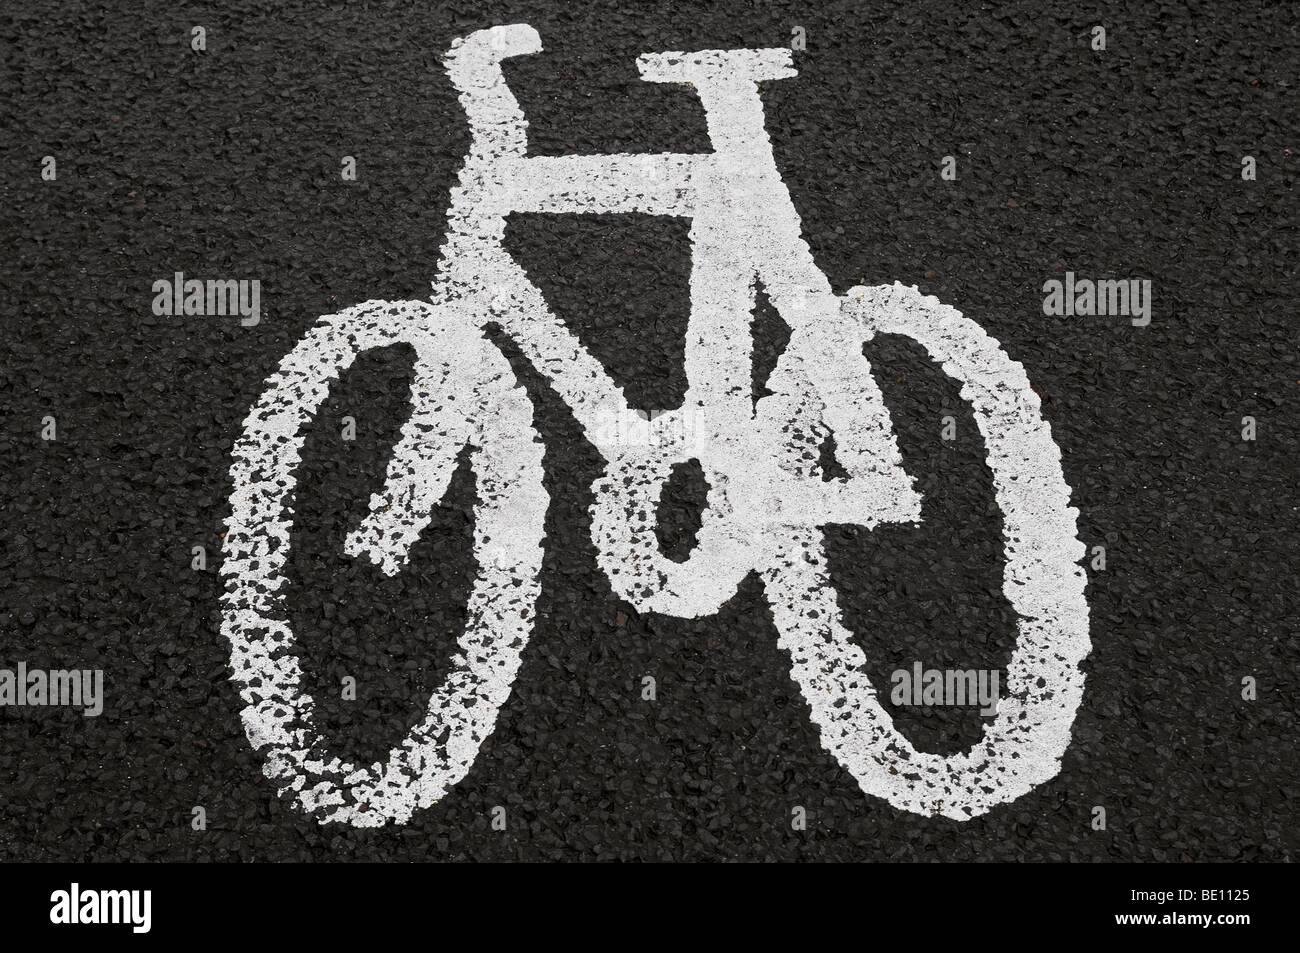 Cycle Lane Symbol Painted on Tarmac - Stock Image